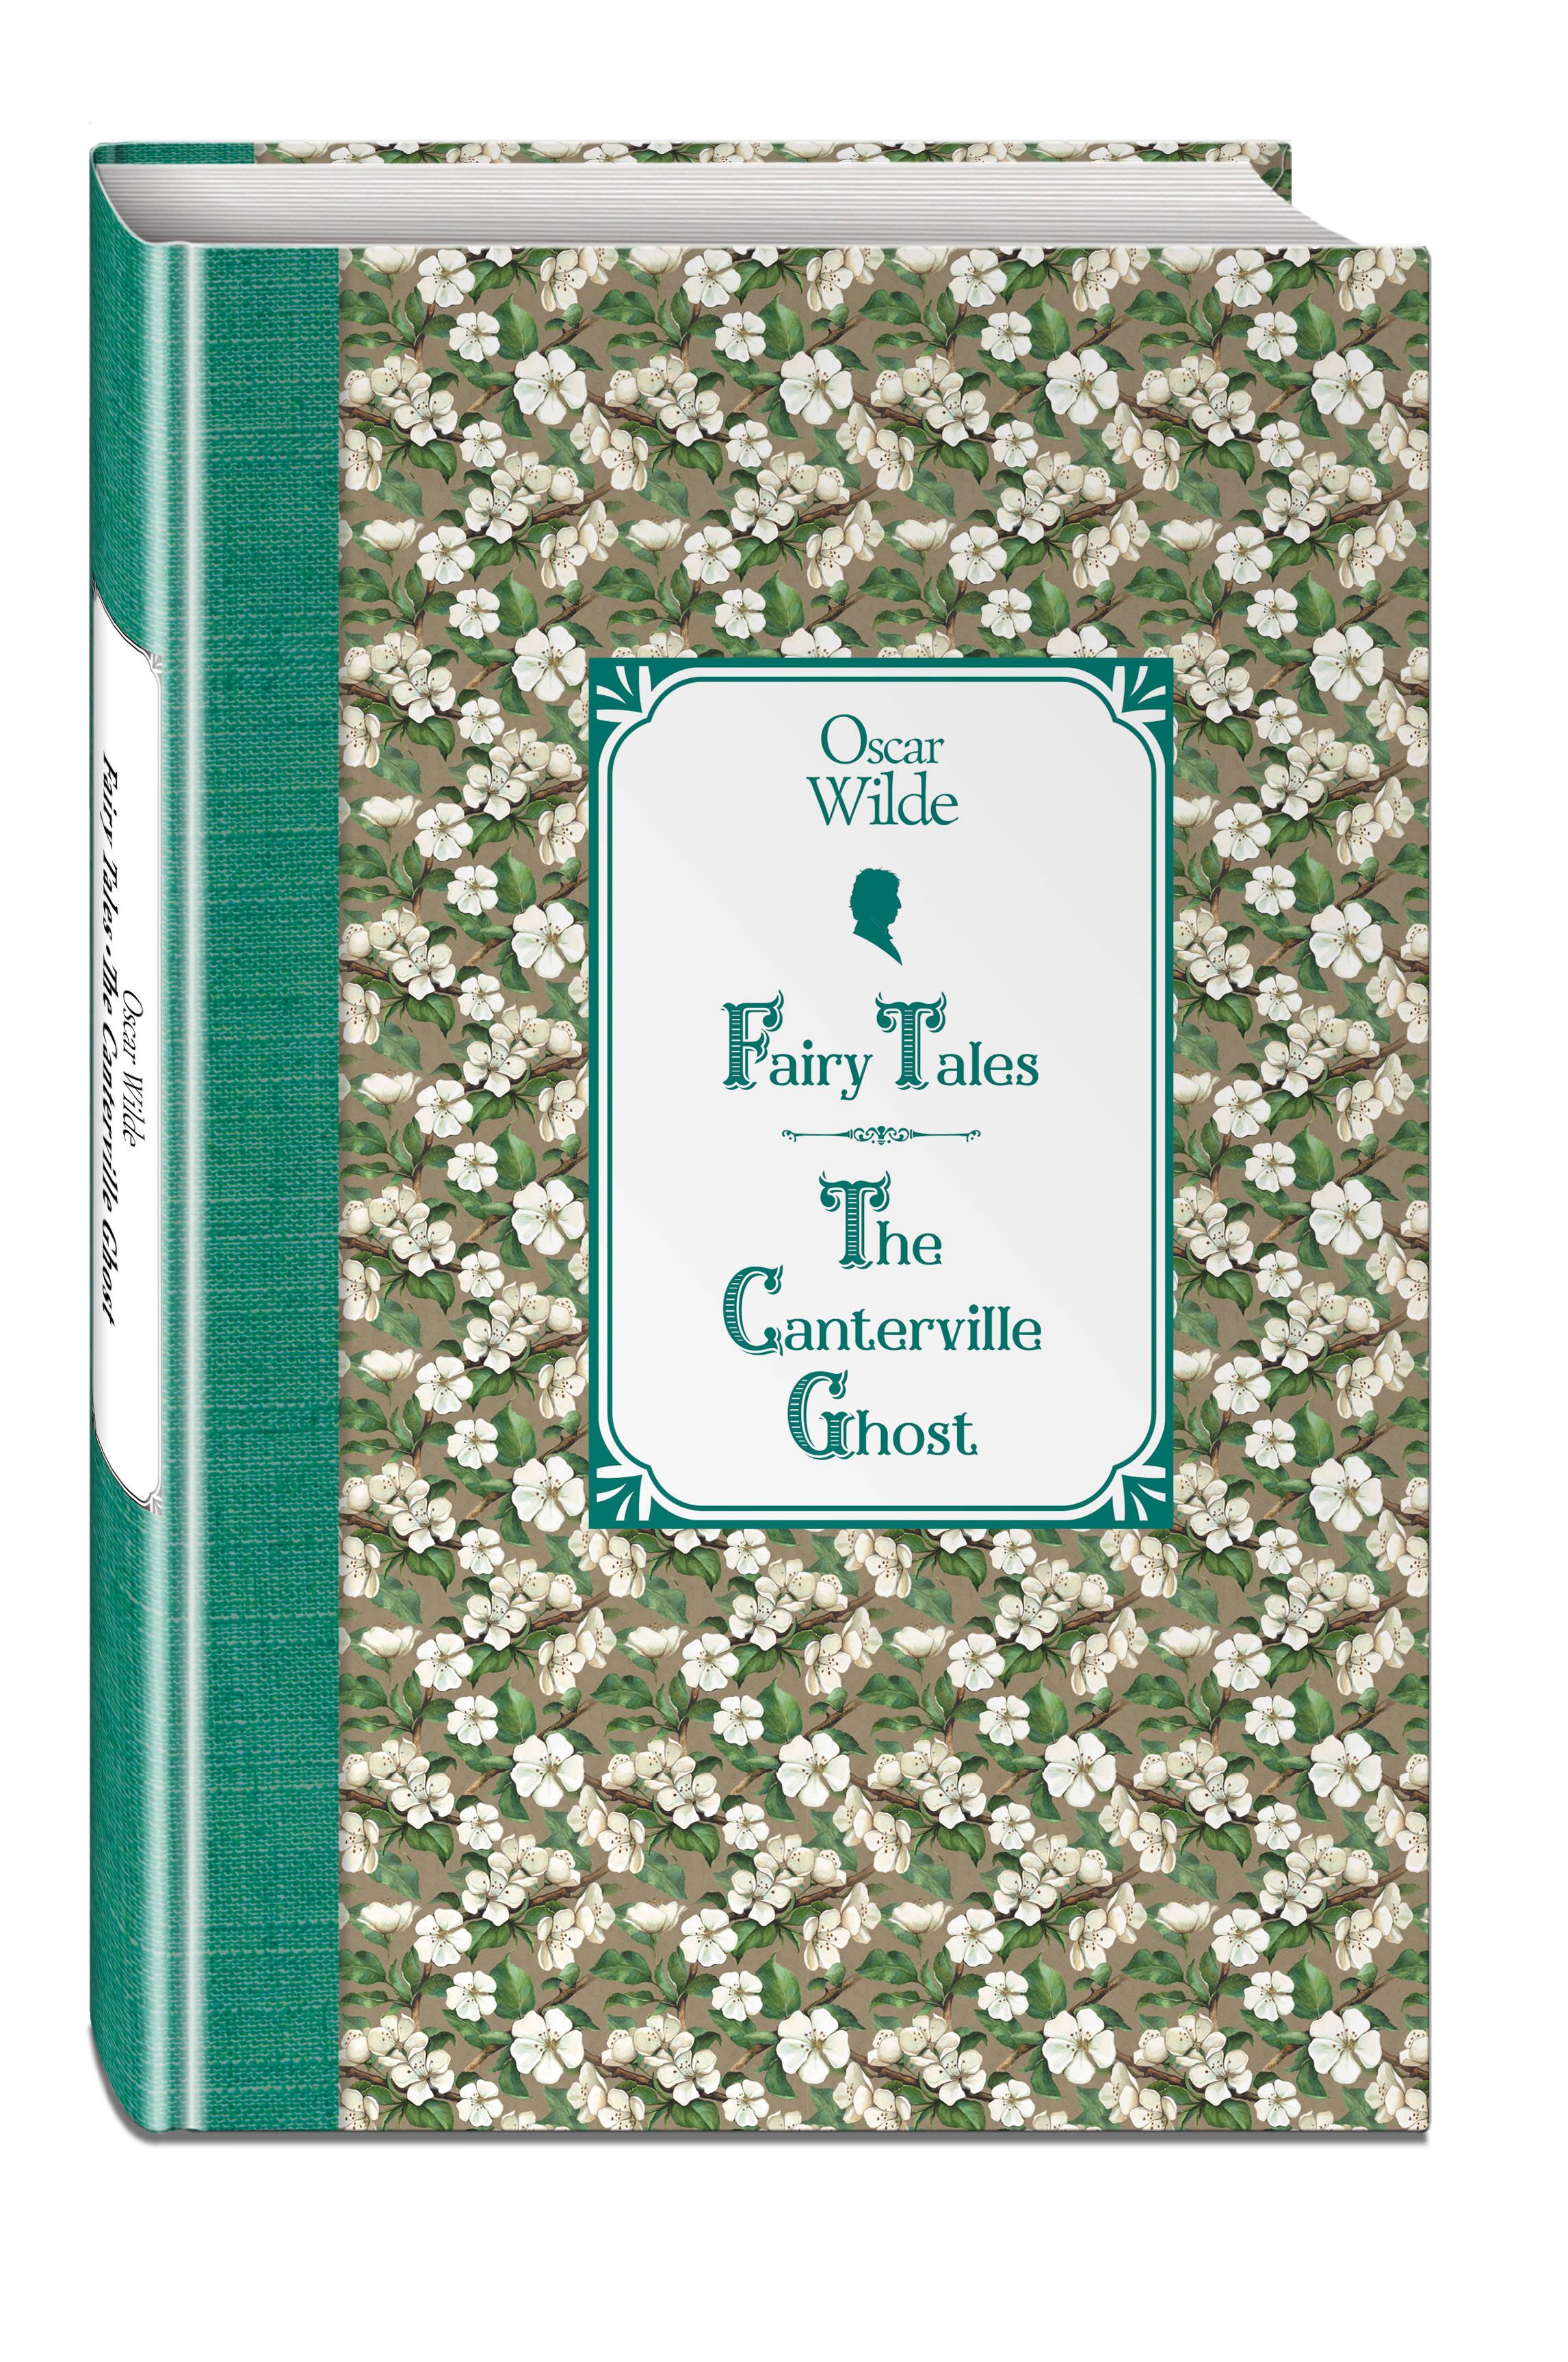 Сказки. Кентервильское привидение = Fairy Tales. The Canterville Ghost